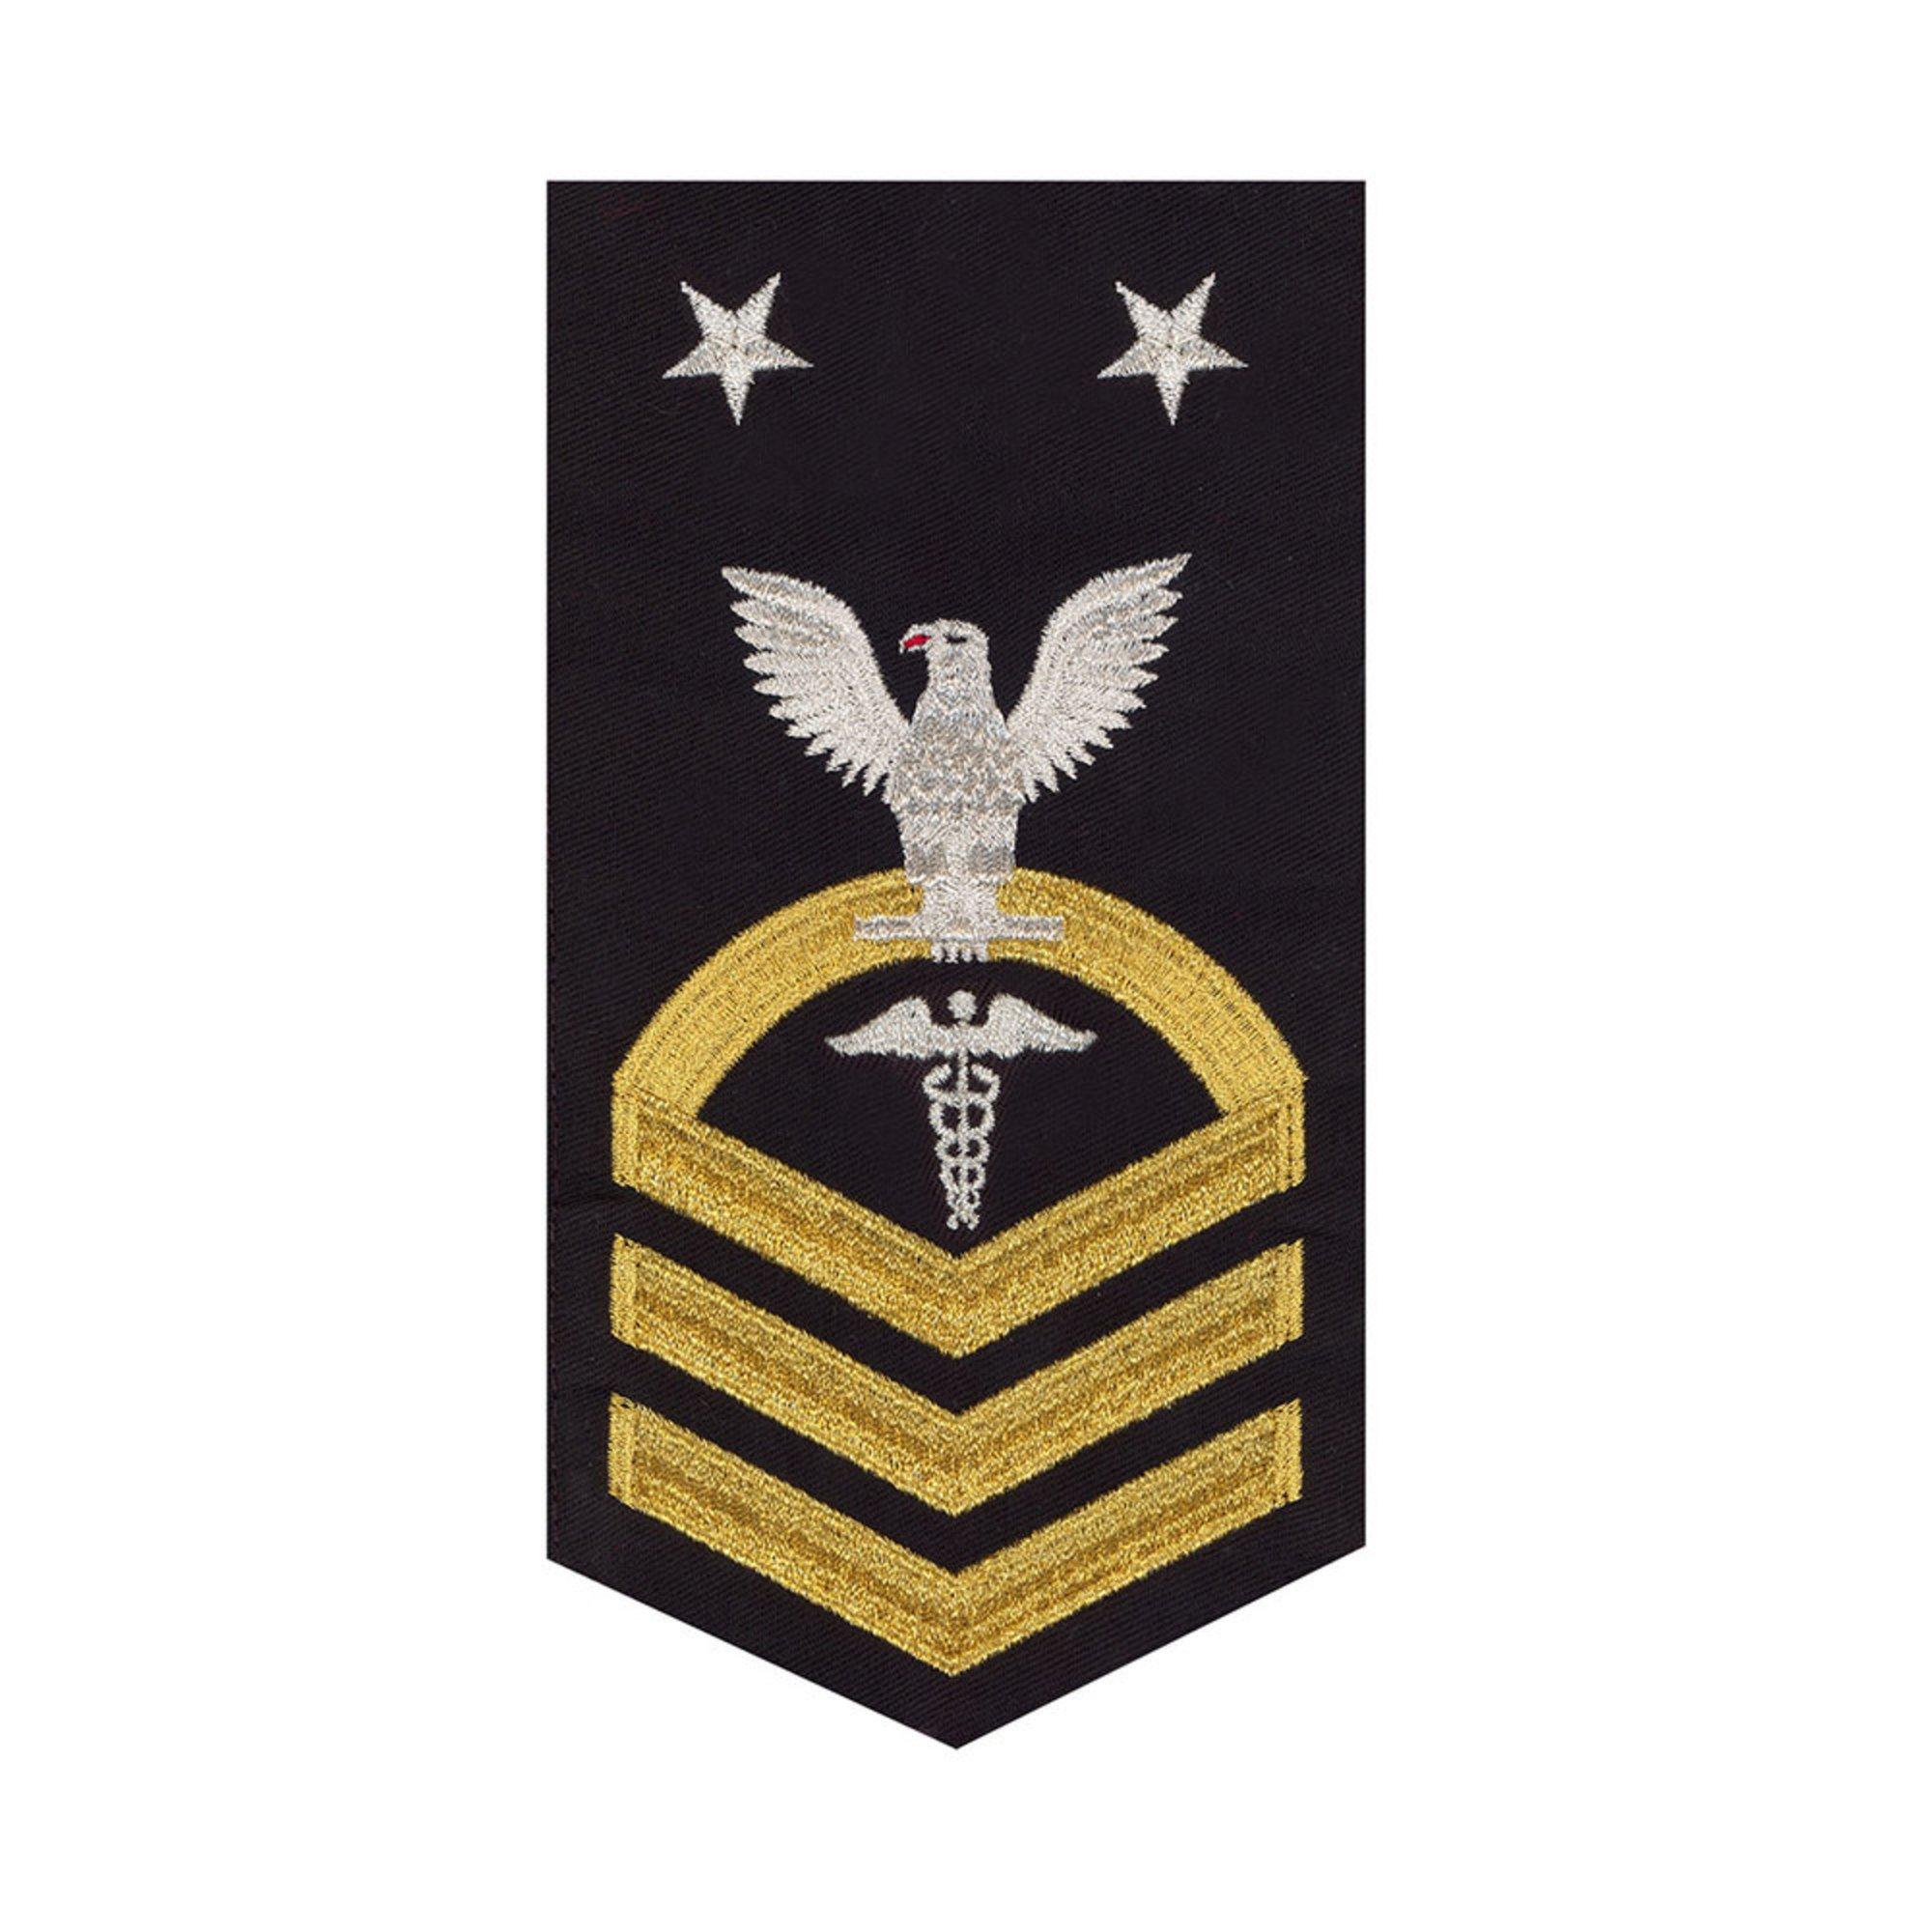 Men's E9 (hmcm) Rating Badge In Standard Gold On Blue Poly